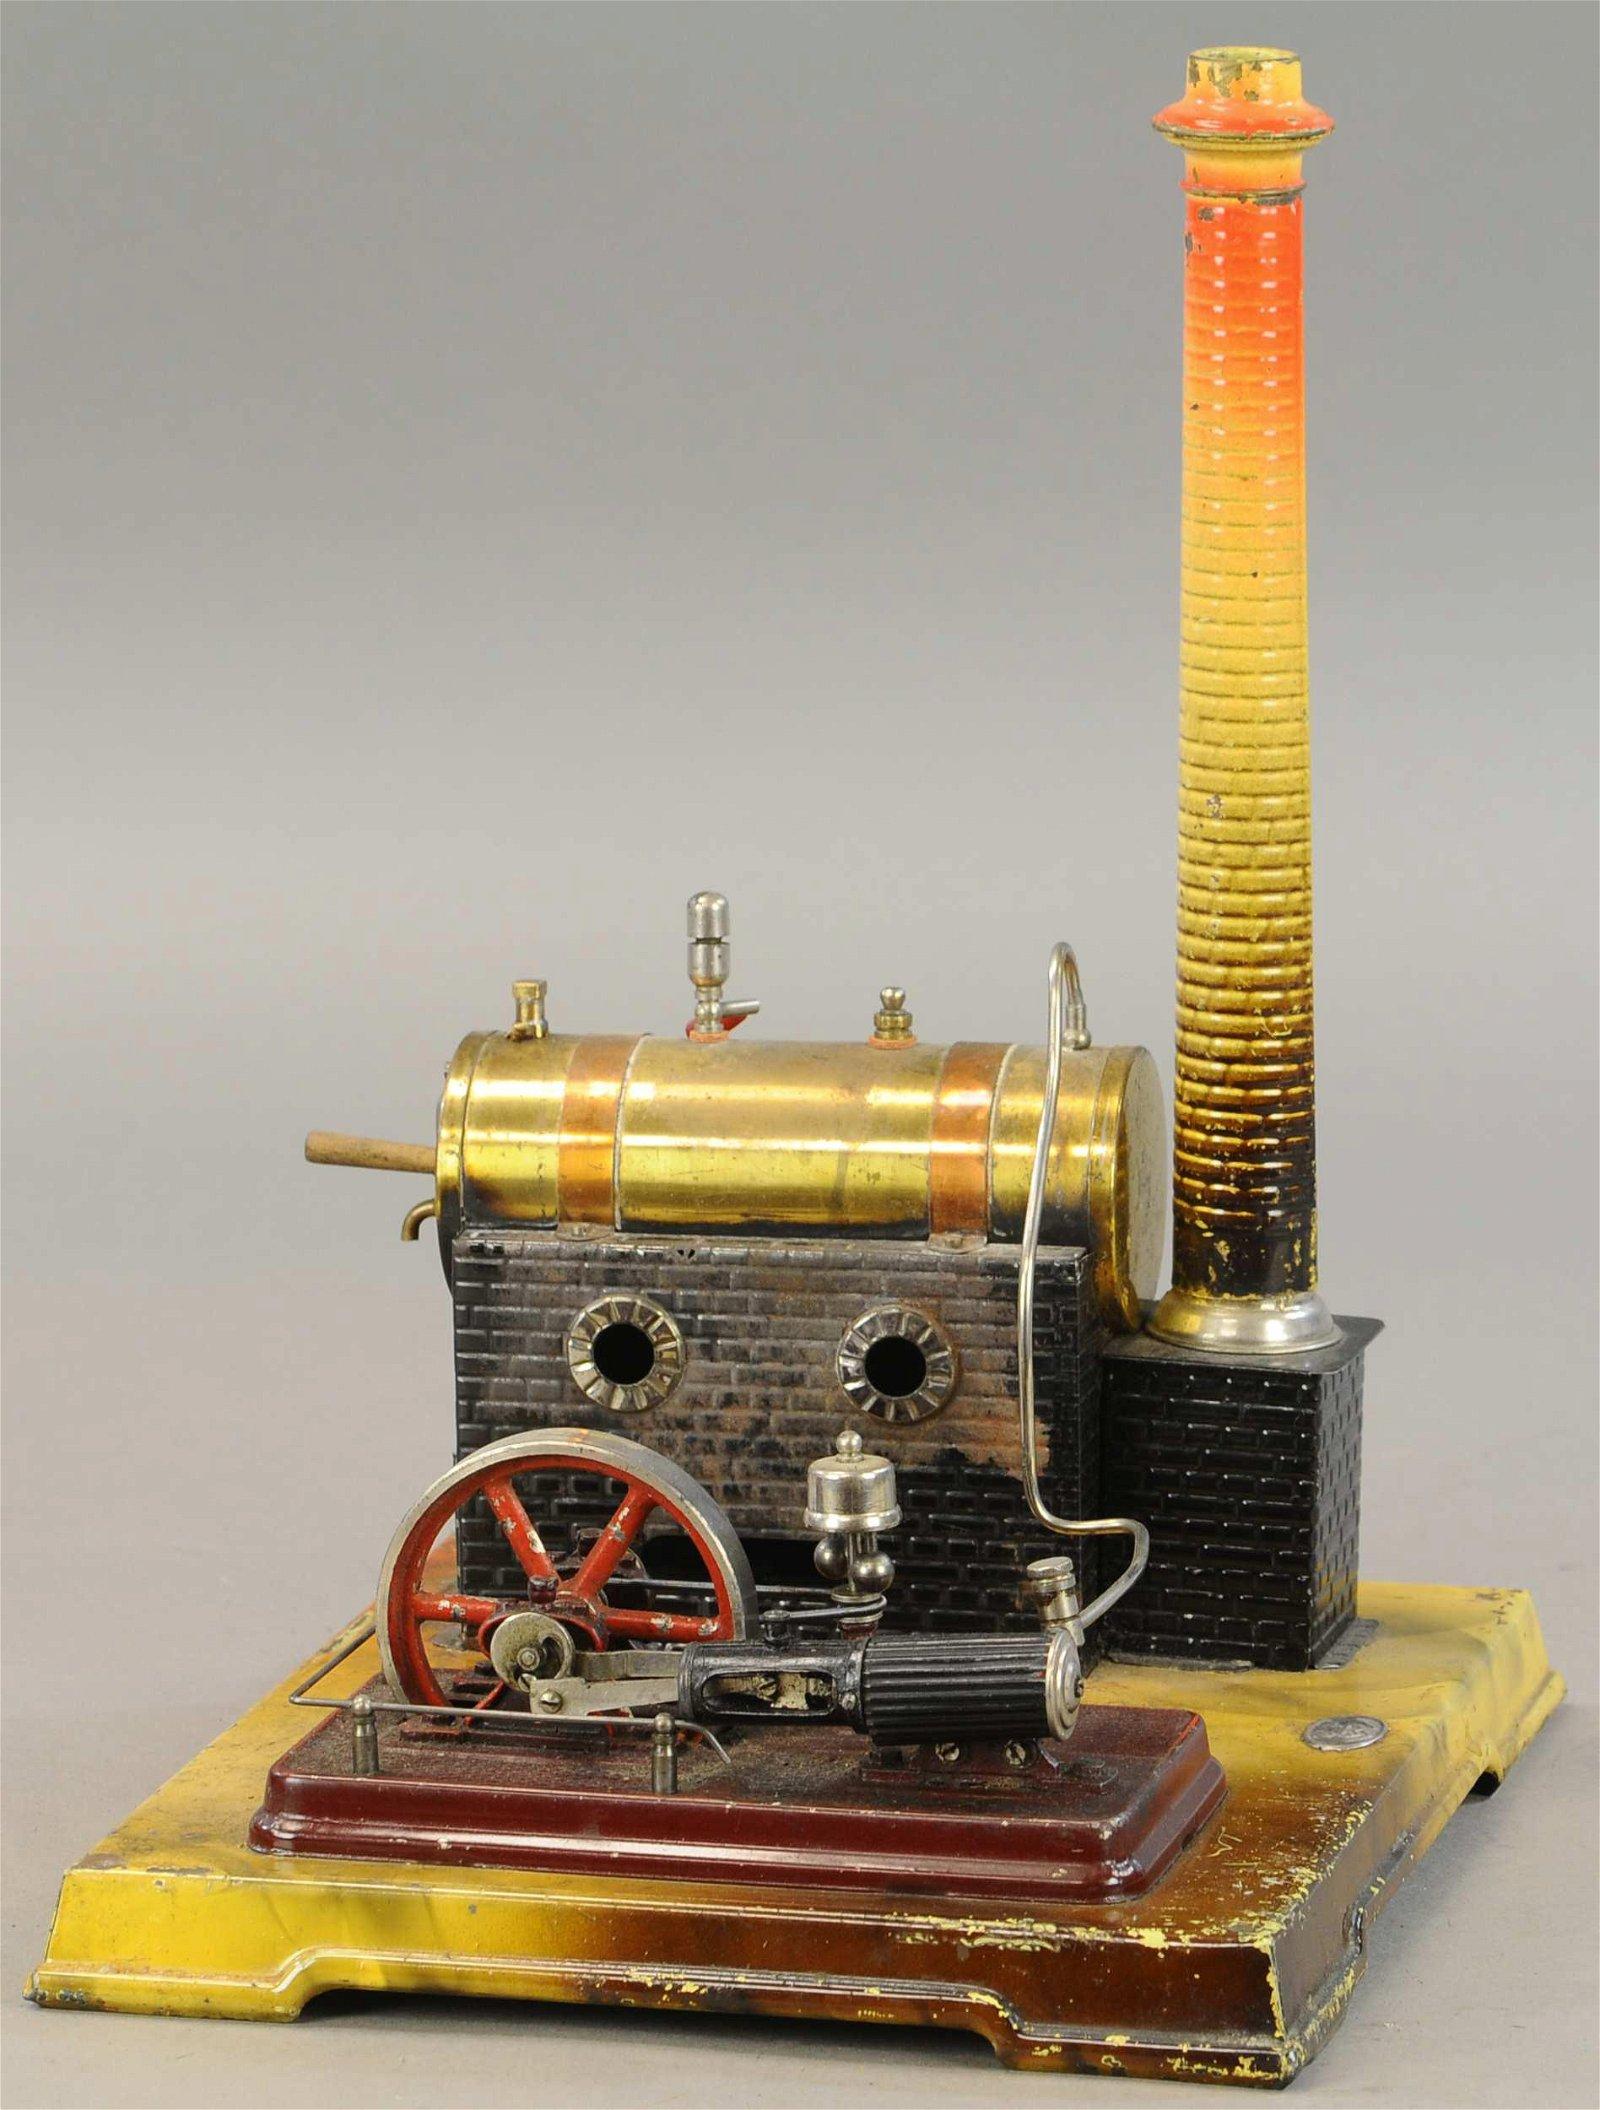 FALK 1930 HORIZONAL ENGINE